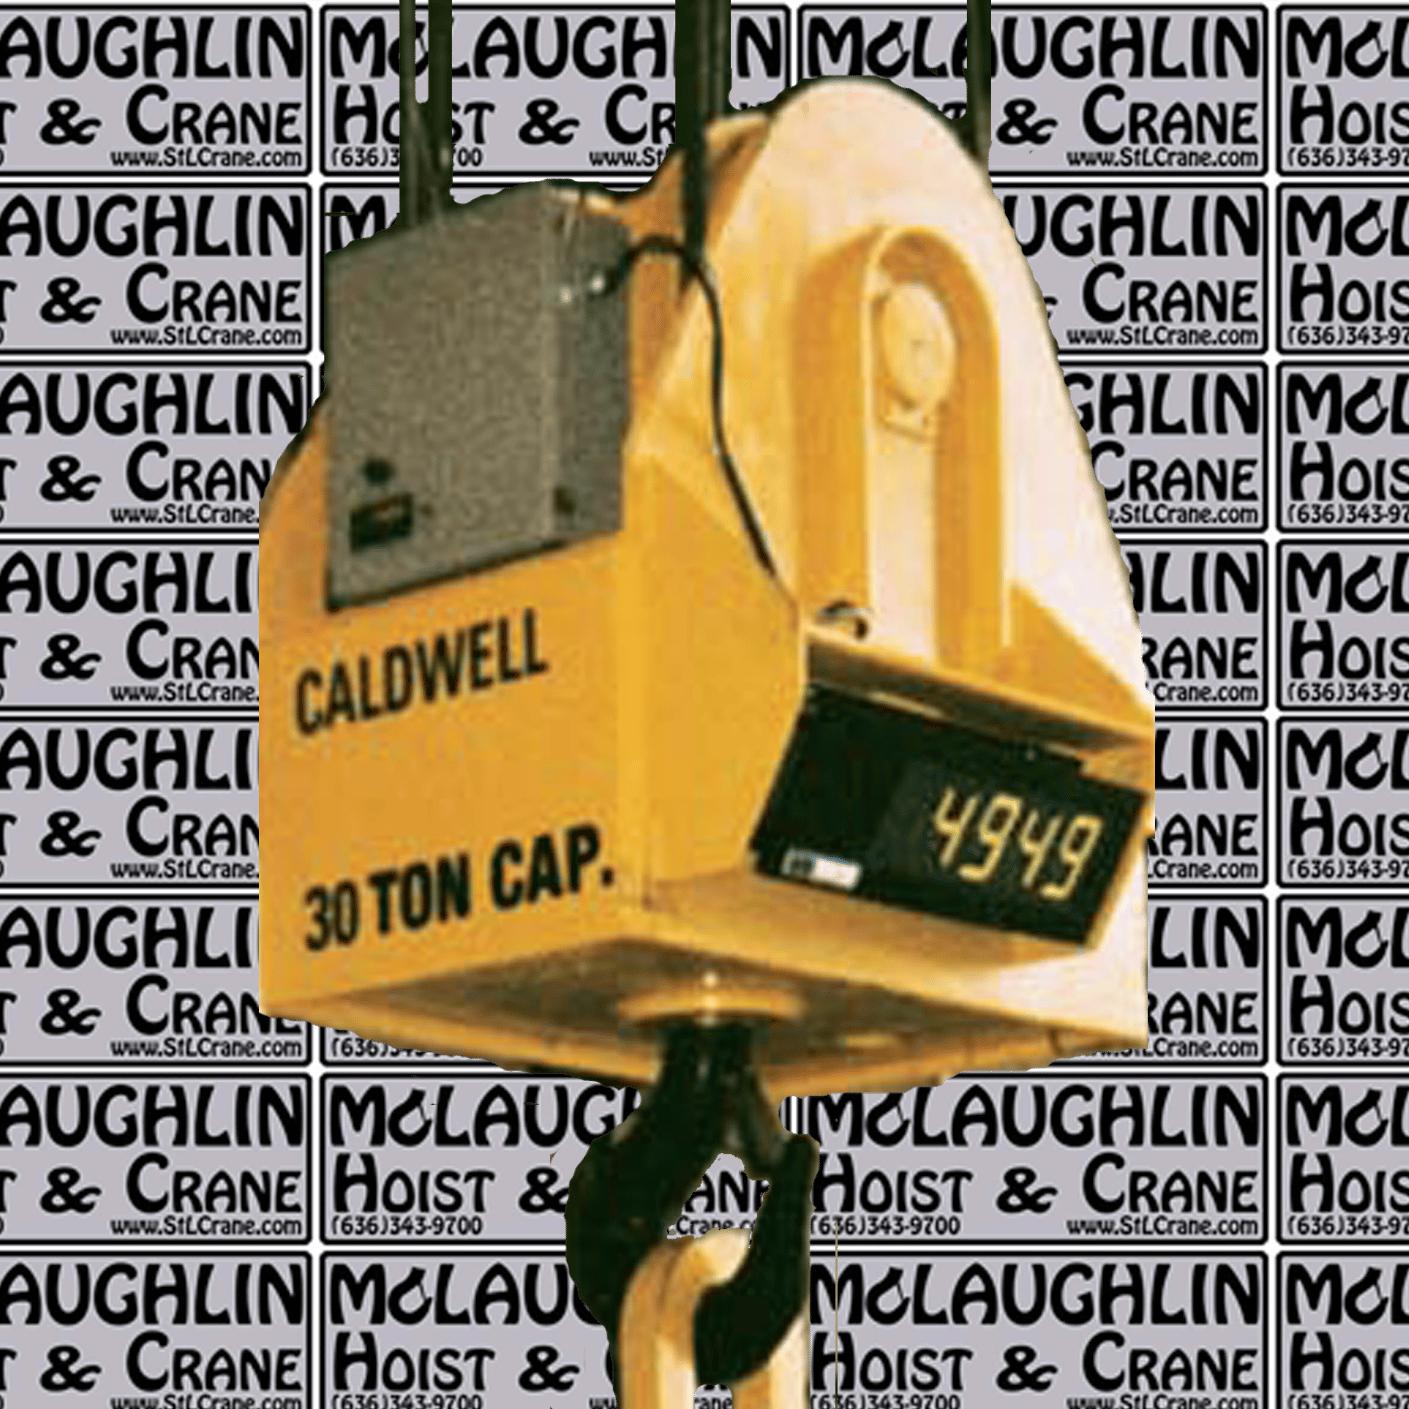 Caldwell Strong-Bac® Rotating Crane Hooks